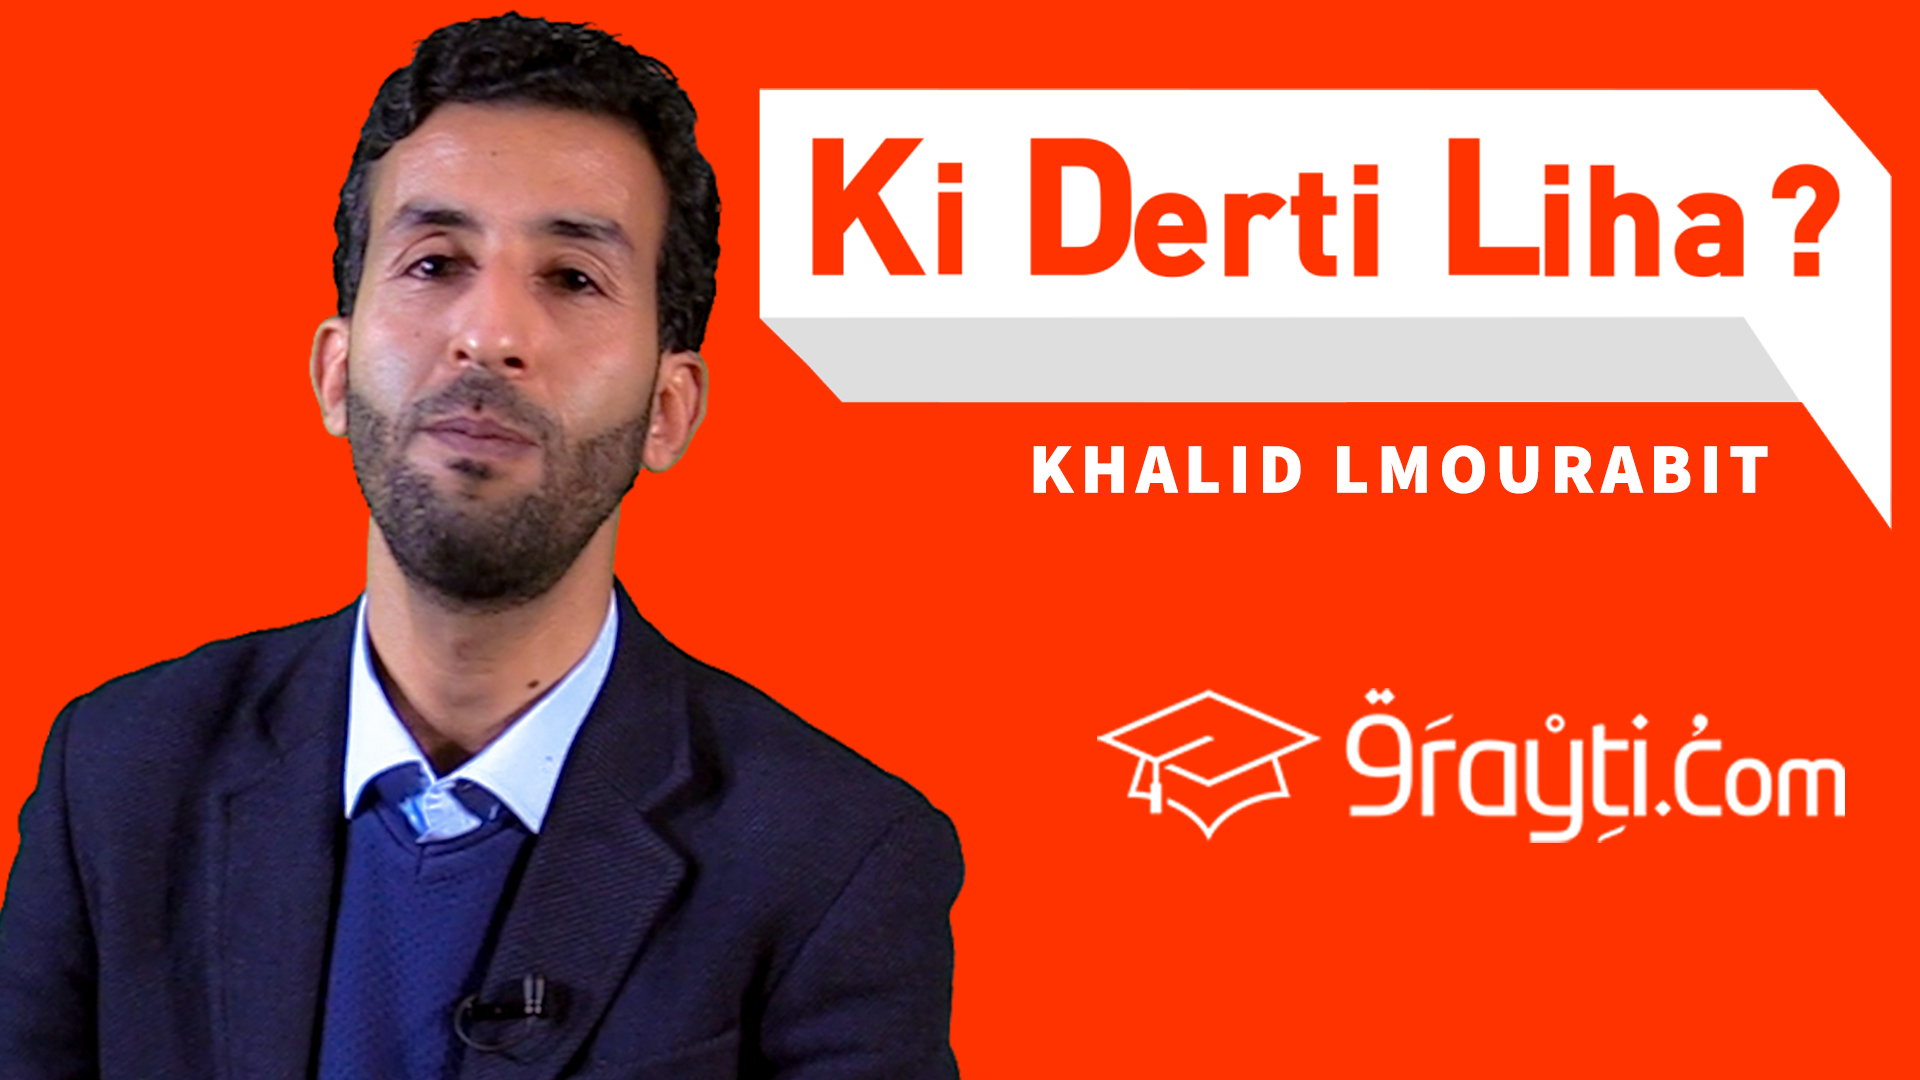 KDL-الحلقة 6- خالد المرابط، طبّوغراف من أنزا، غيعرّفنا على المهنة و الشّغف ديالو بالرسم الكاريكاتوري